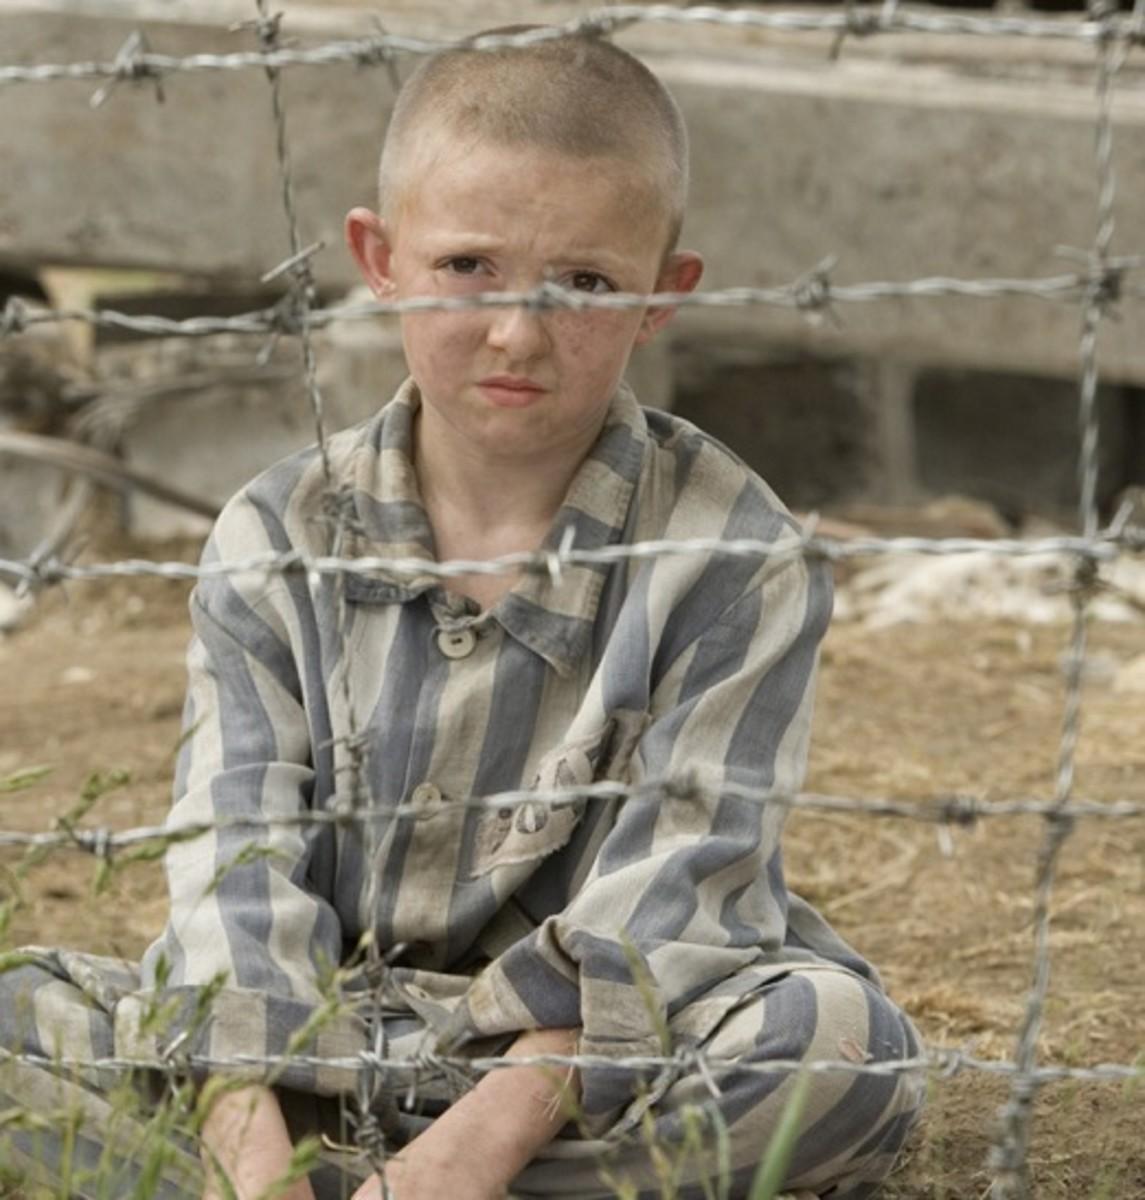 Jack Scanlon in The Boy in the Striped Pyjamas (2008)